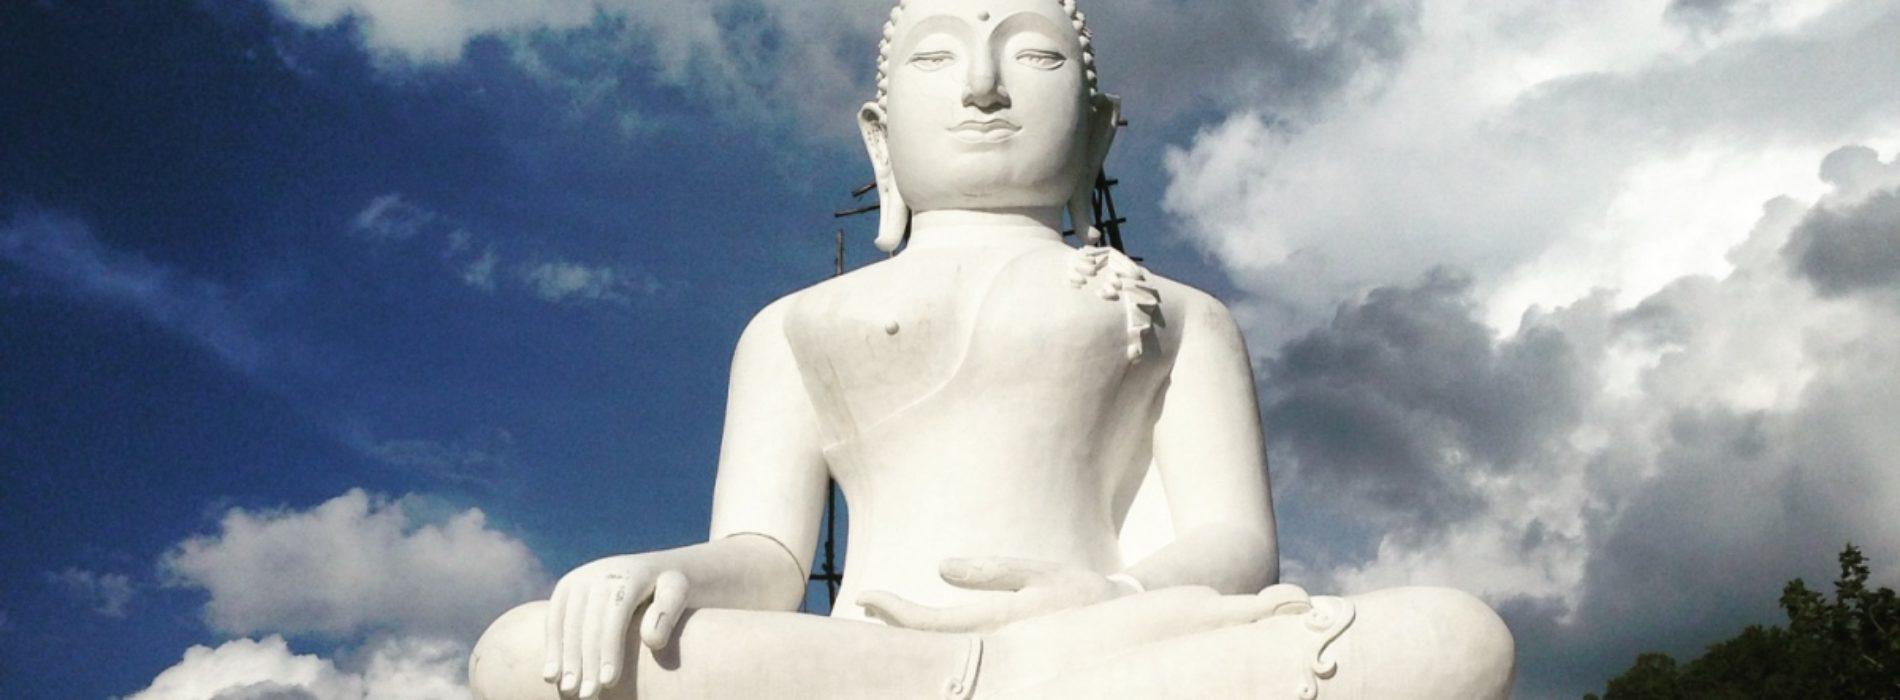 Destination de nomade: Les 7 merveilles de Pai en Thaïlande